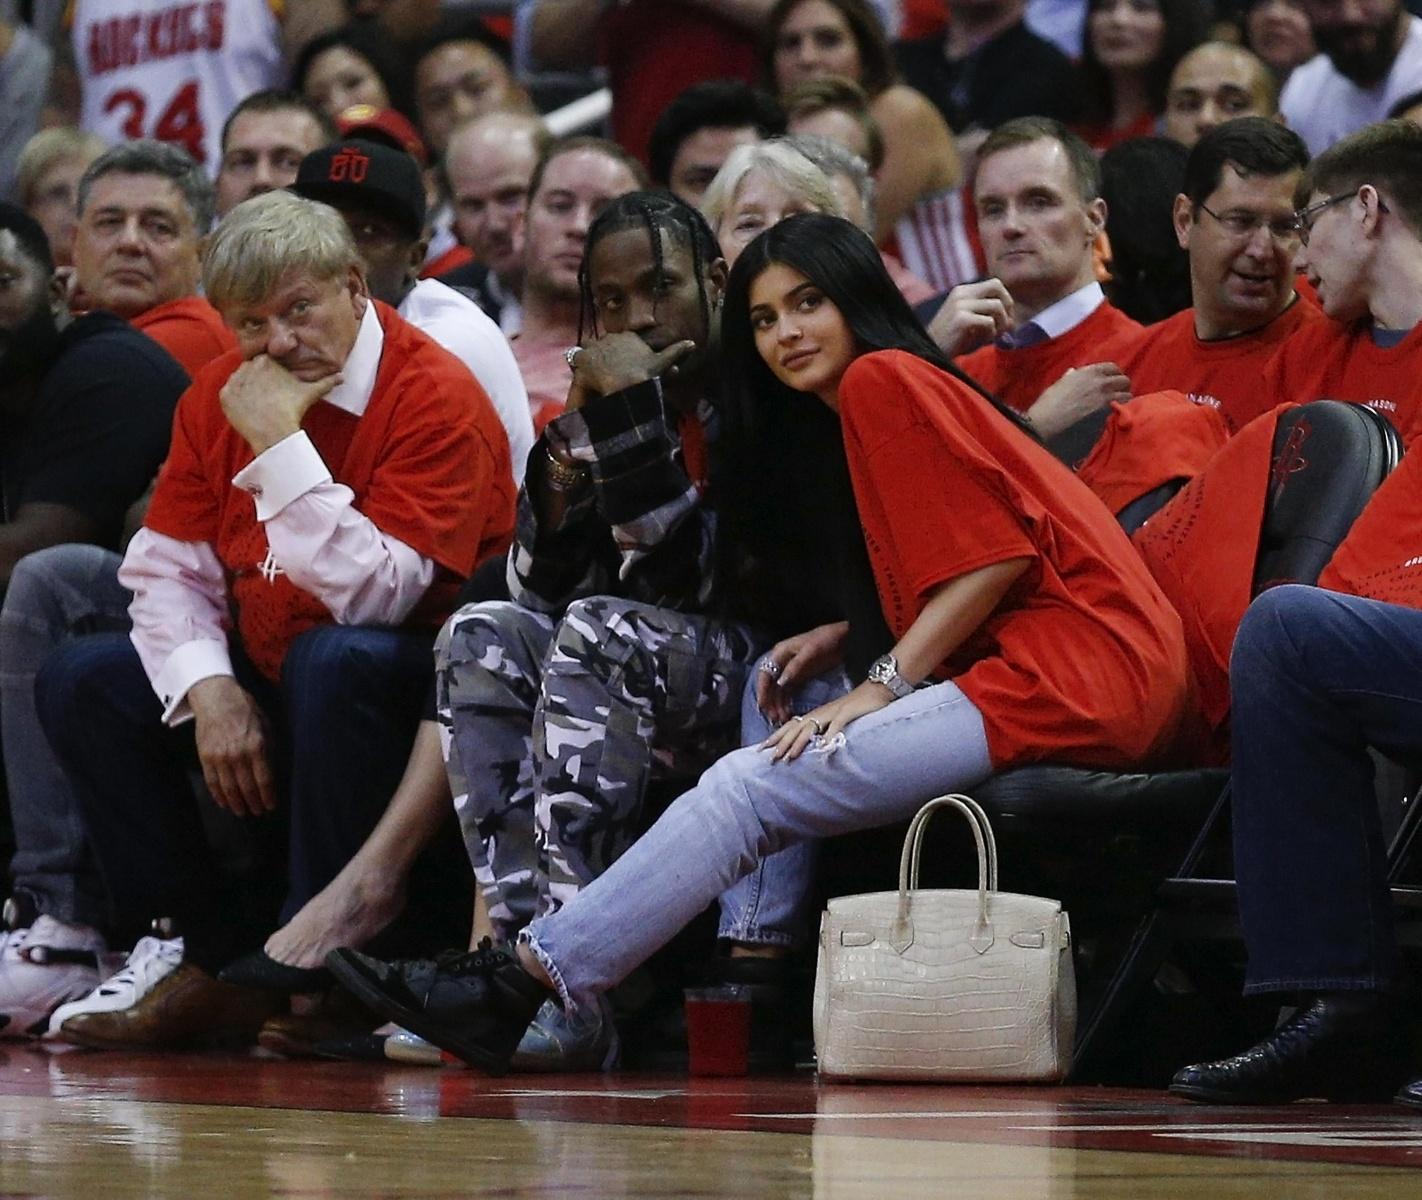 Kylie Jenner & Travis Scott Make It a Court Side Date Night!